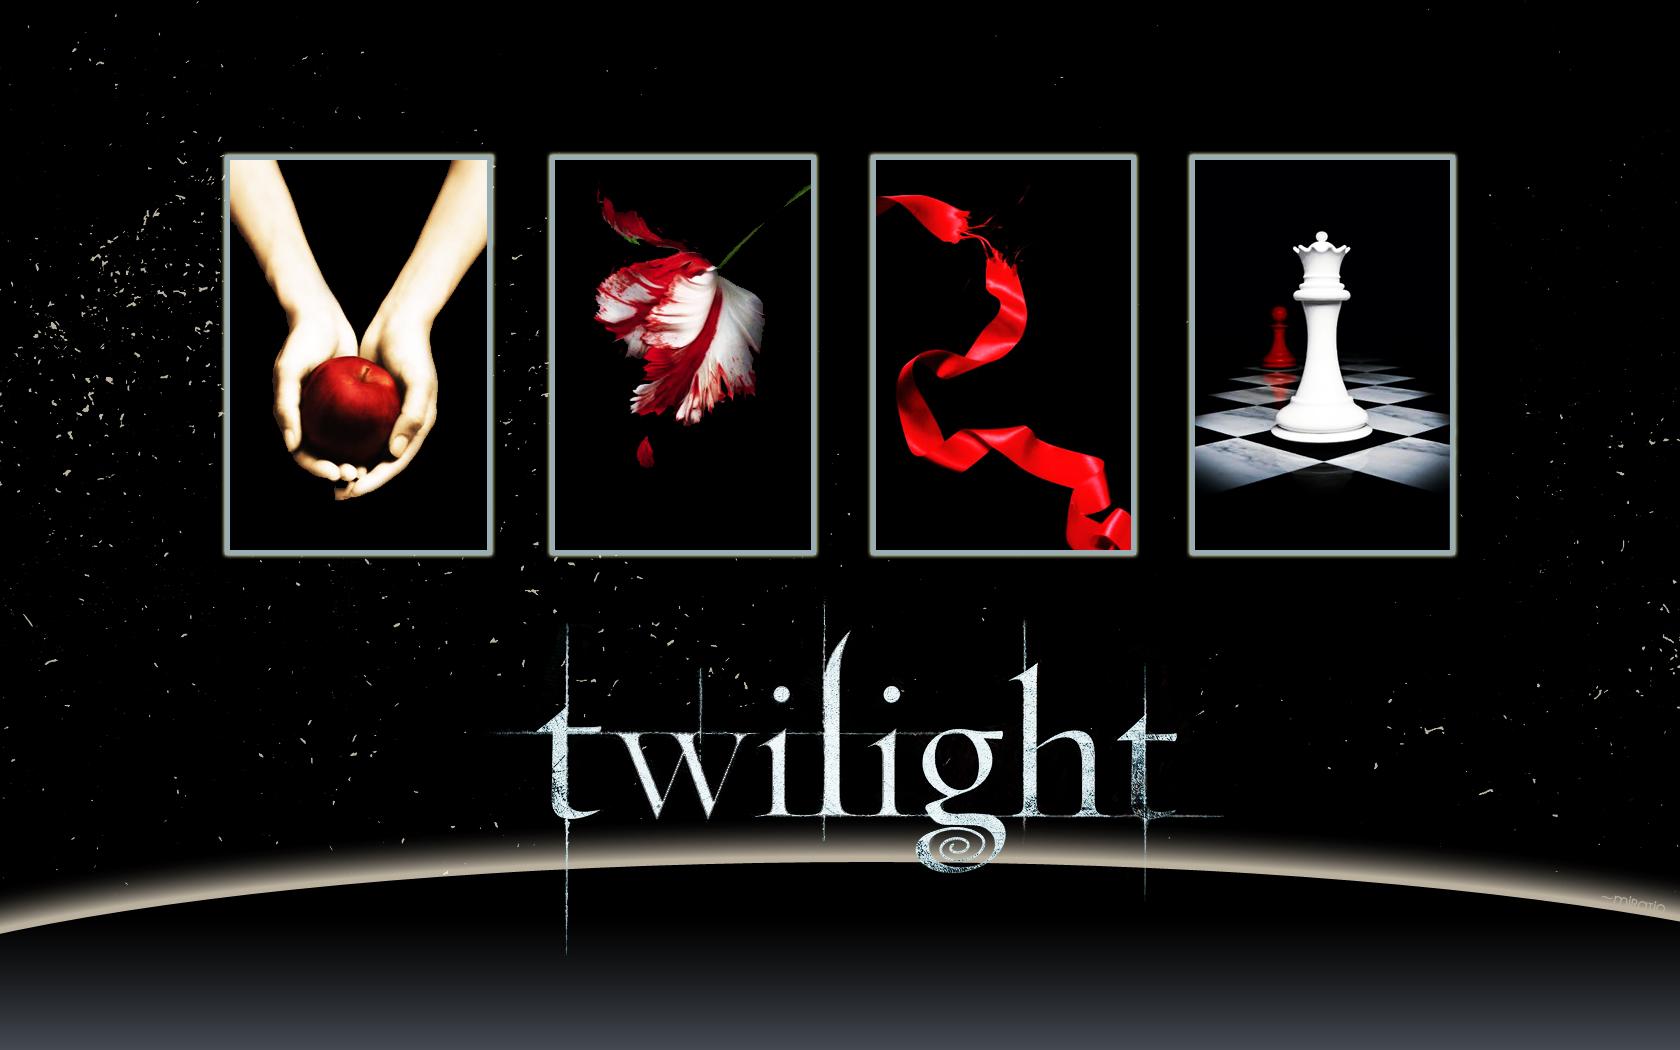 http://fc02.deviantart.net/fs41/f/2009/013/8/9/Twilight_Saga__Books_Wallpaper_by_miratio.jpg